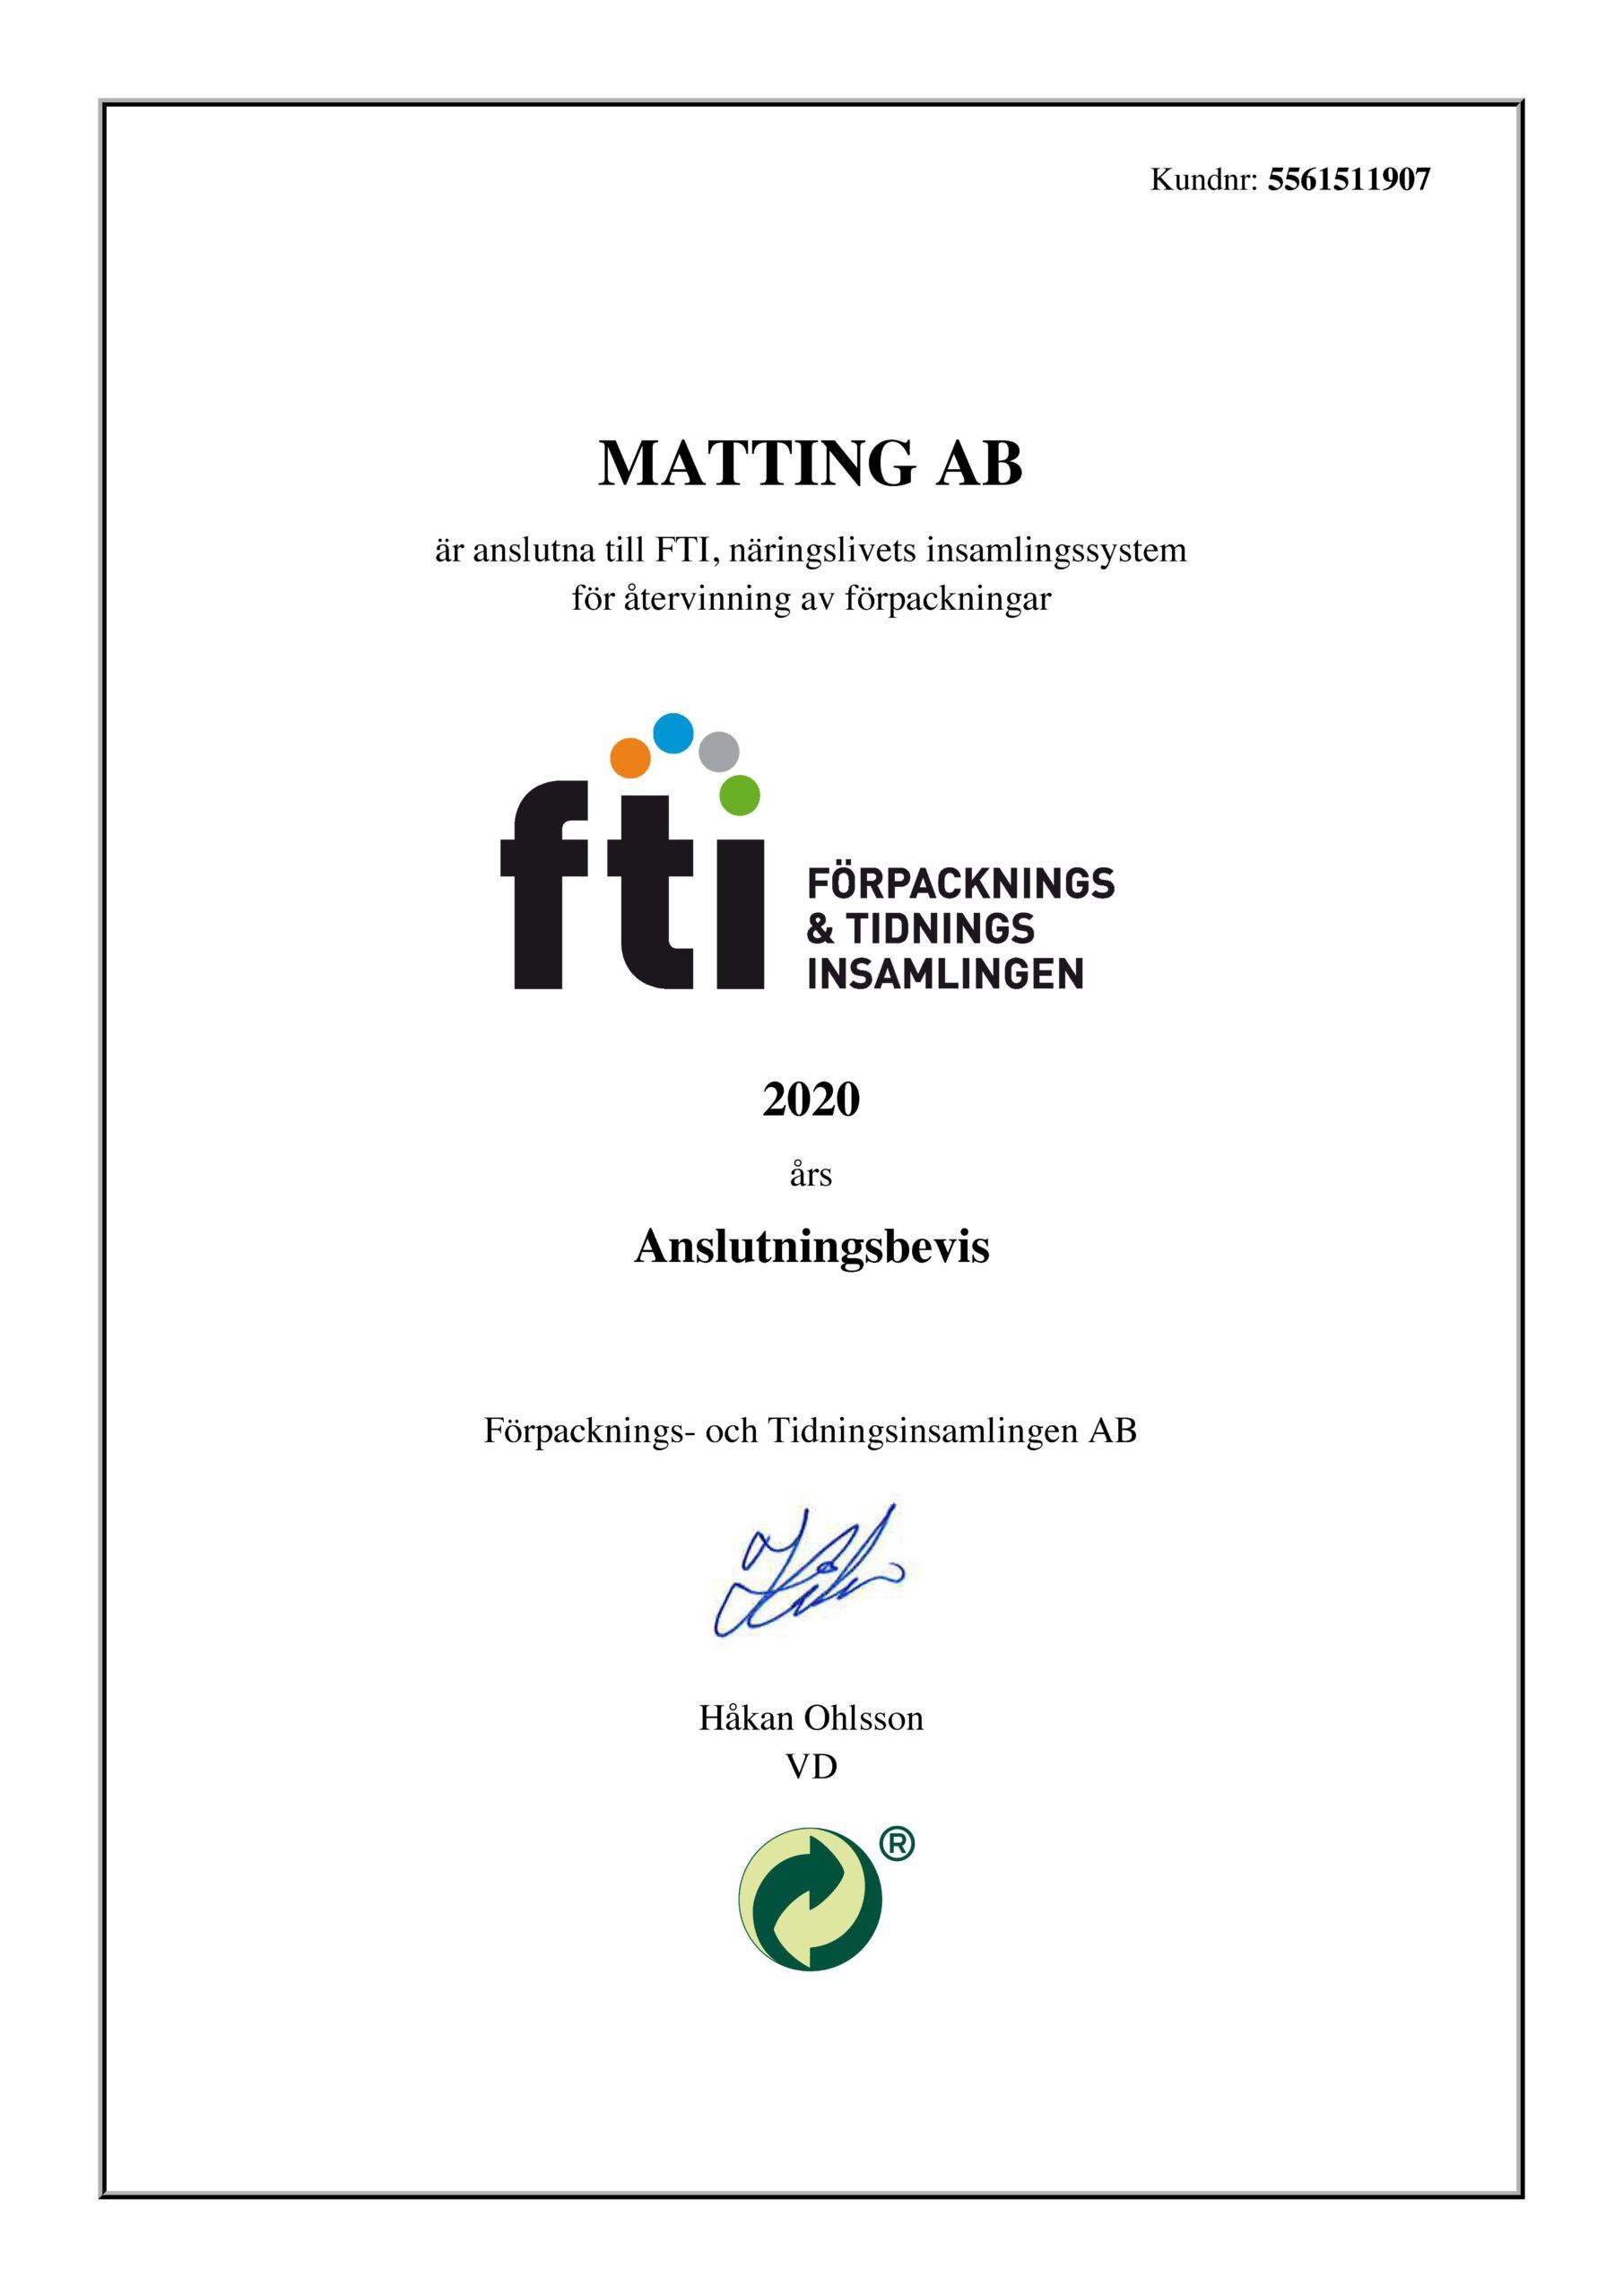 FTI Anslutningsbevis 2020